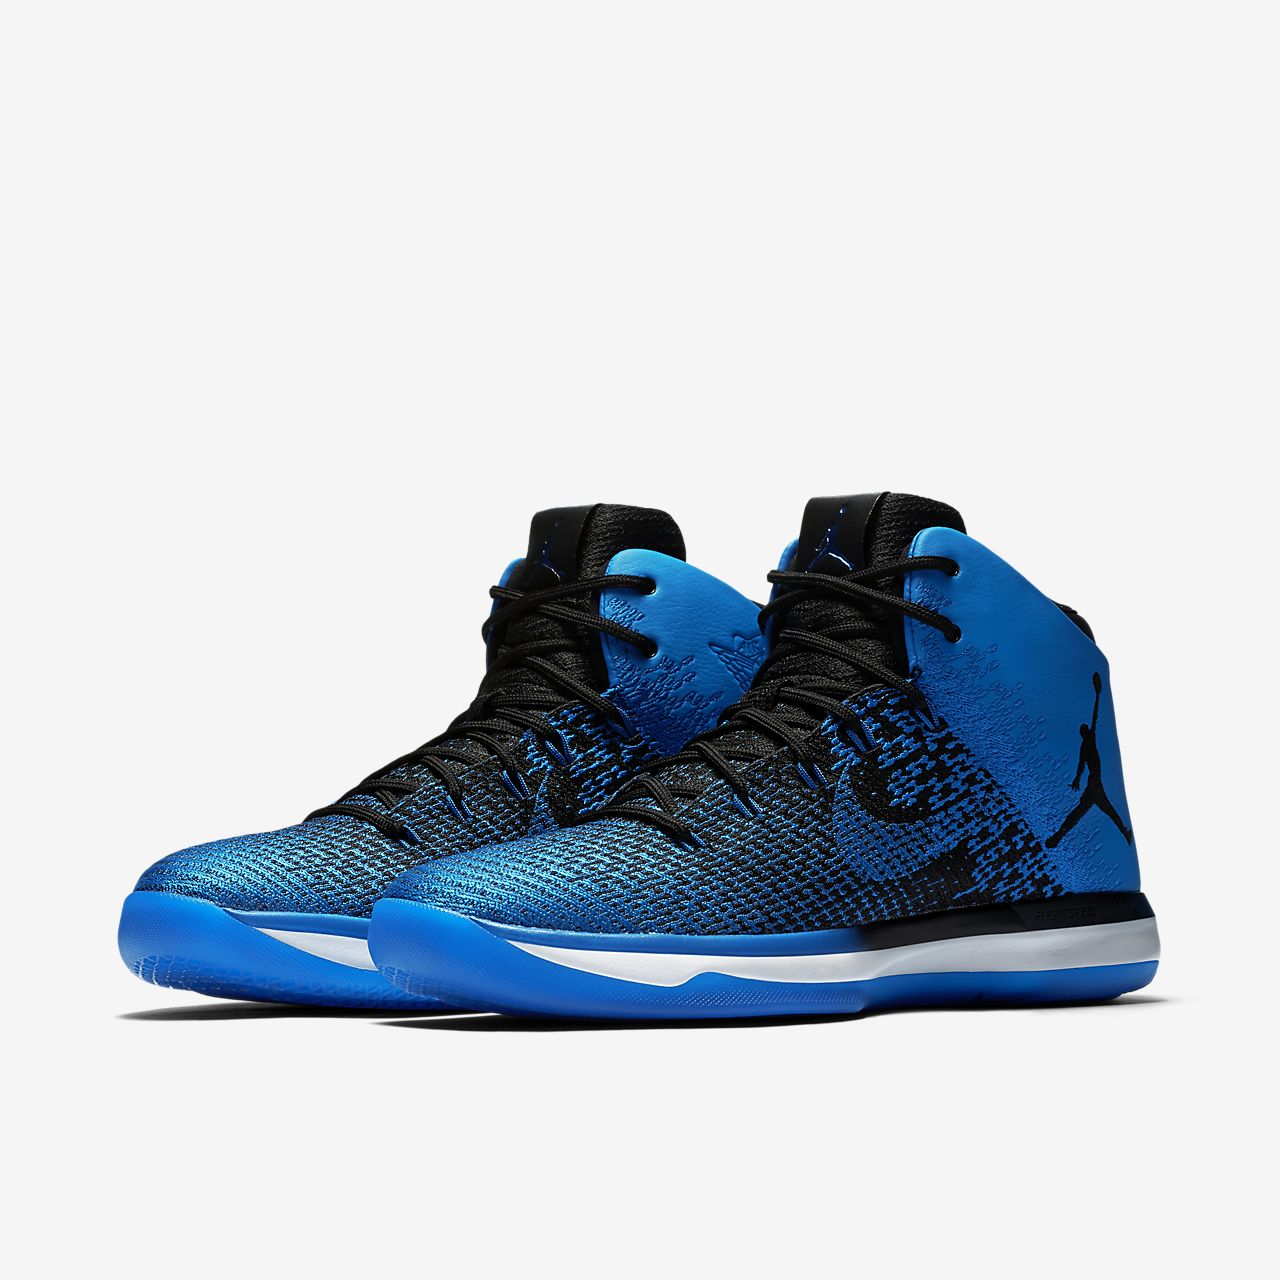 ... Air Jordan XXXI Men's Basketball Shoe